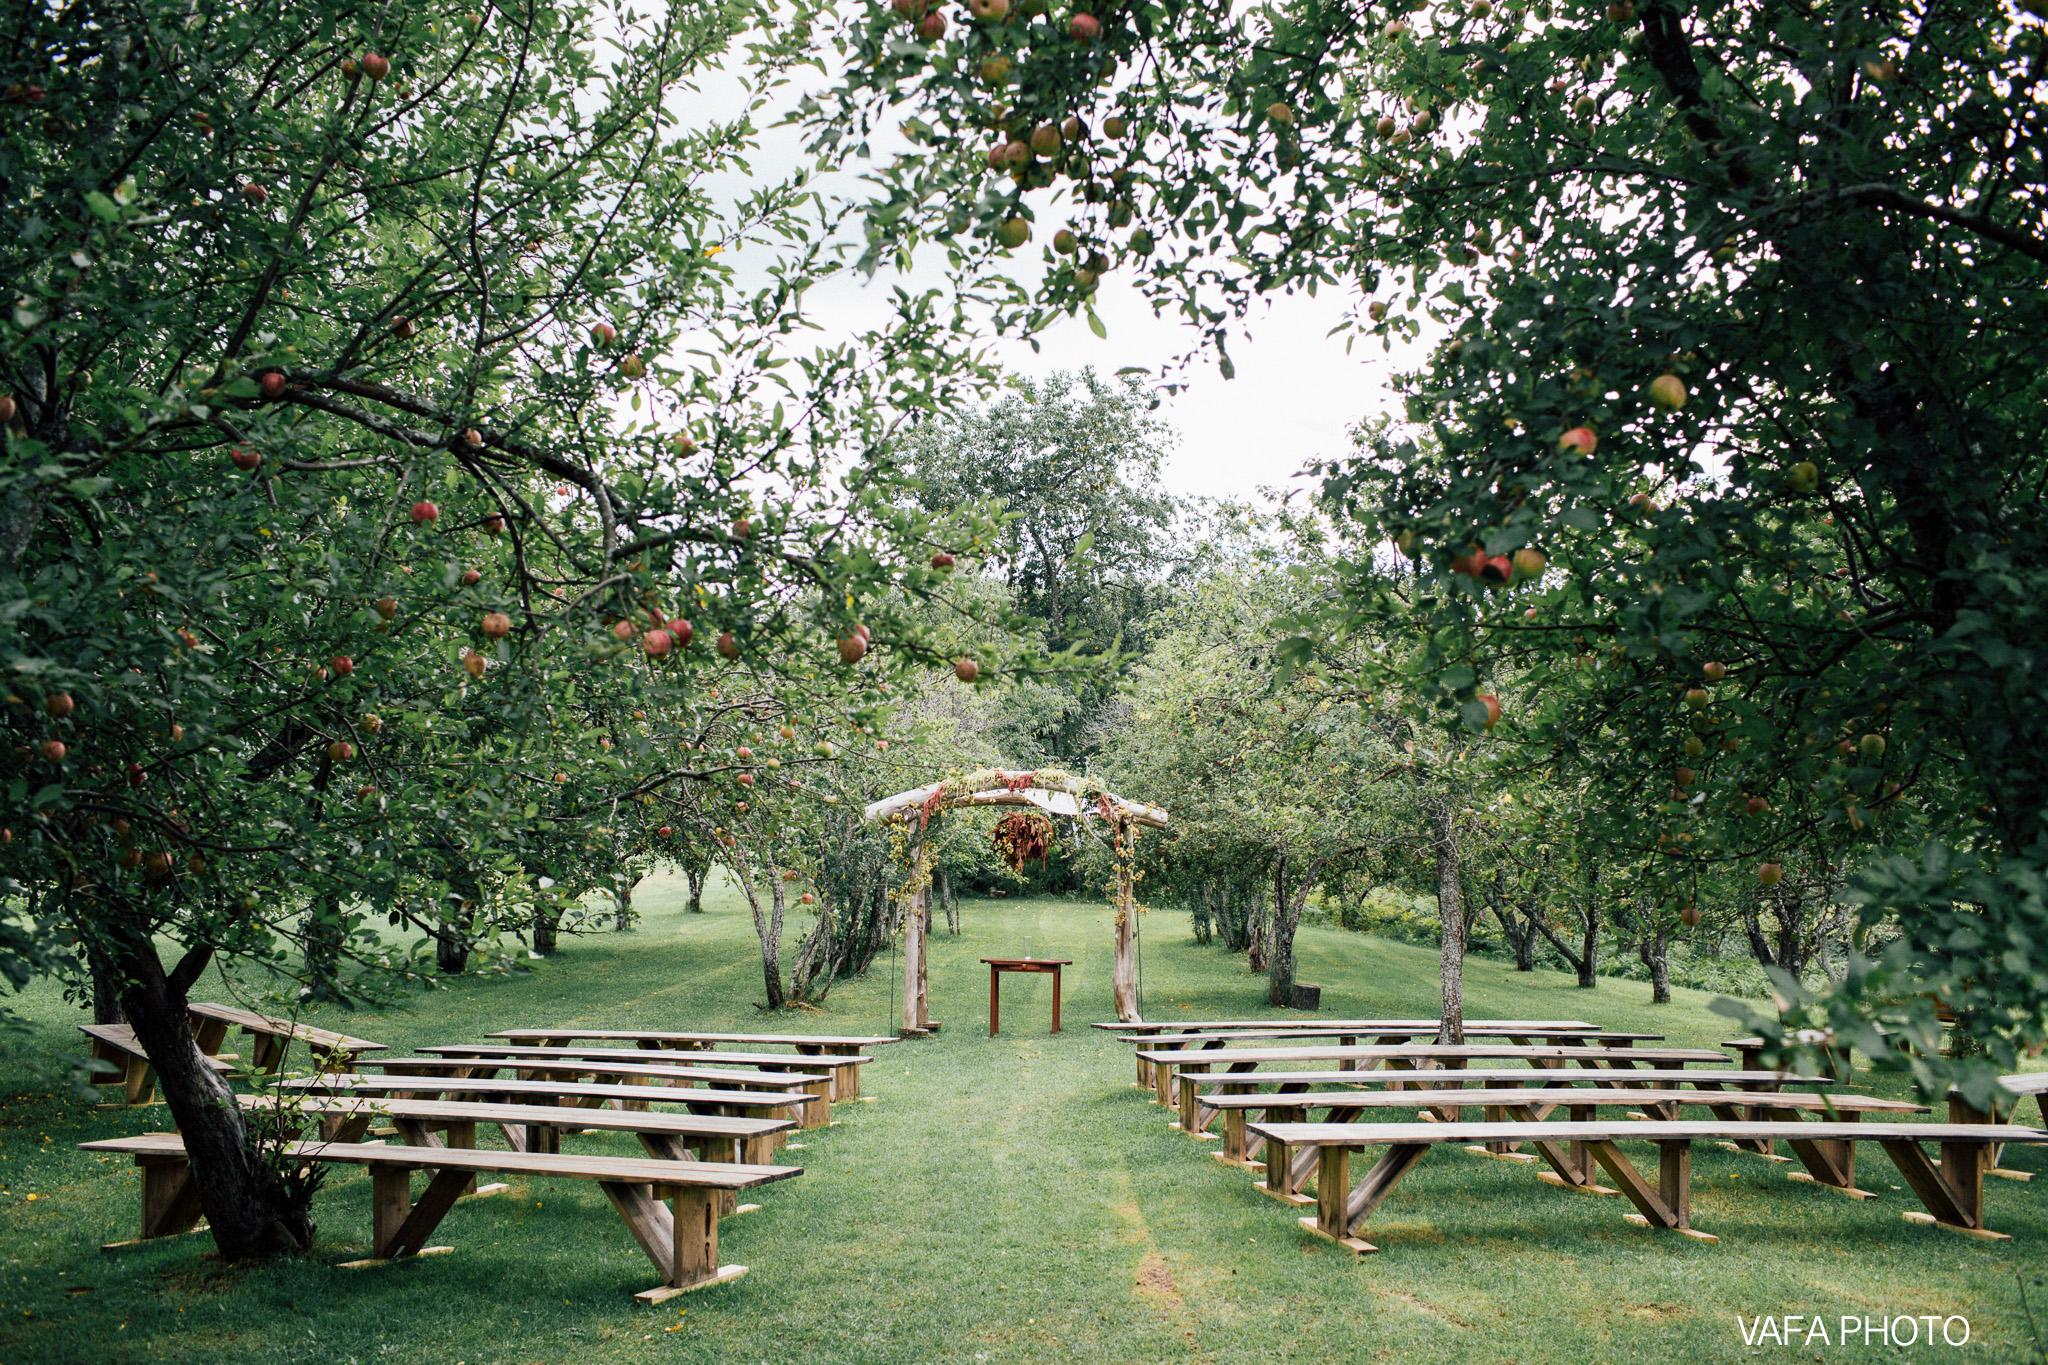 Belsolda-Farm-Wedding-Christy-Eric-Vafa-Photo-351.jpg